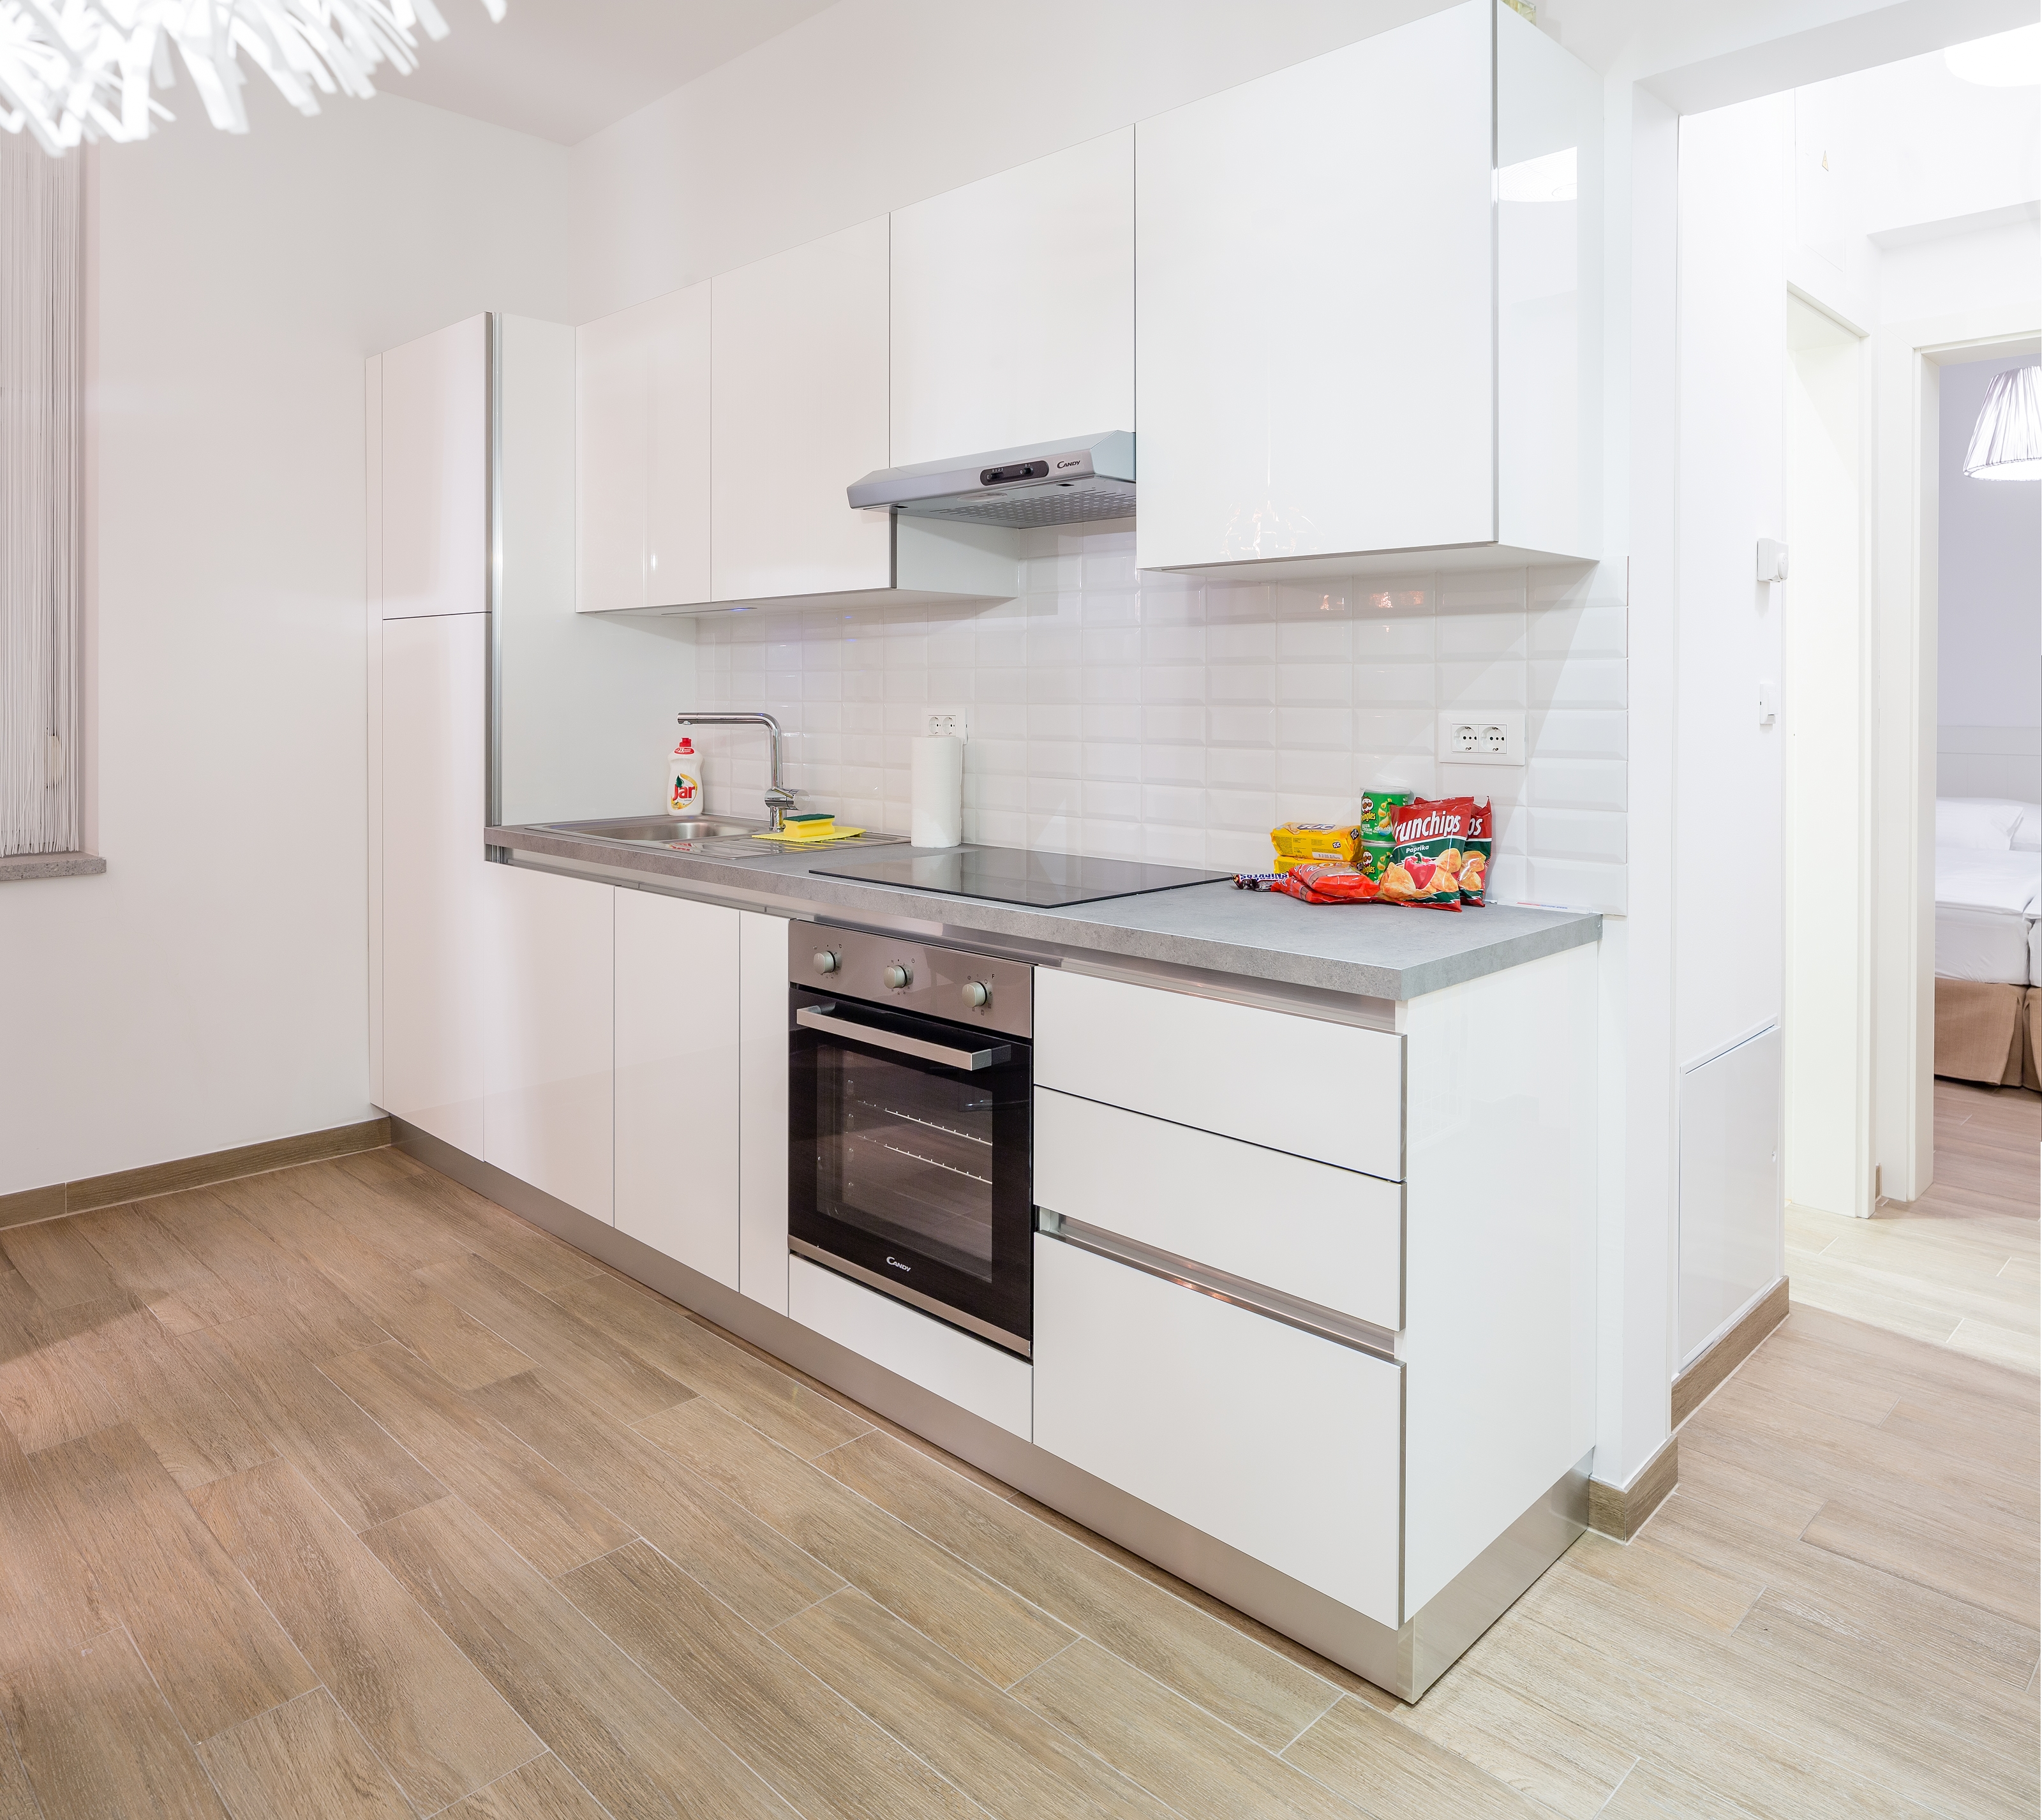 Aaprtment 204 kitchen